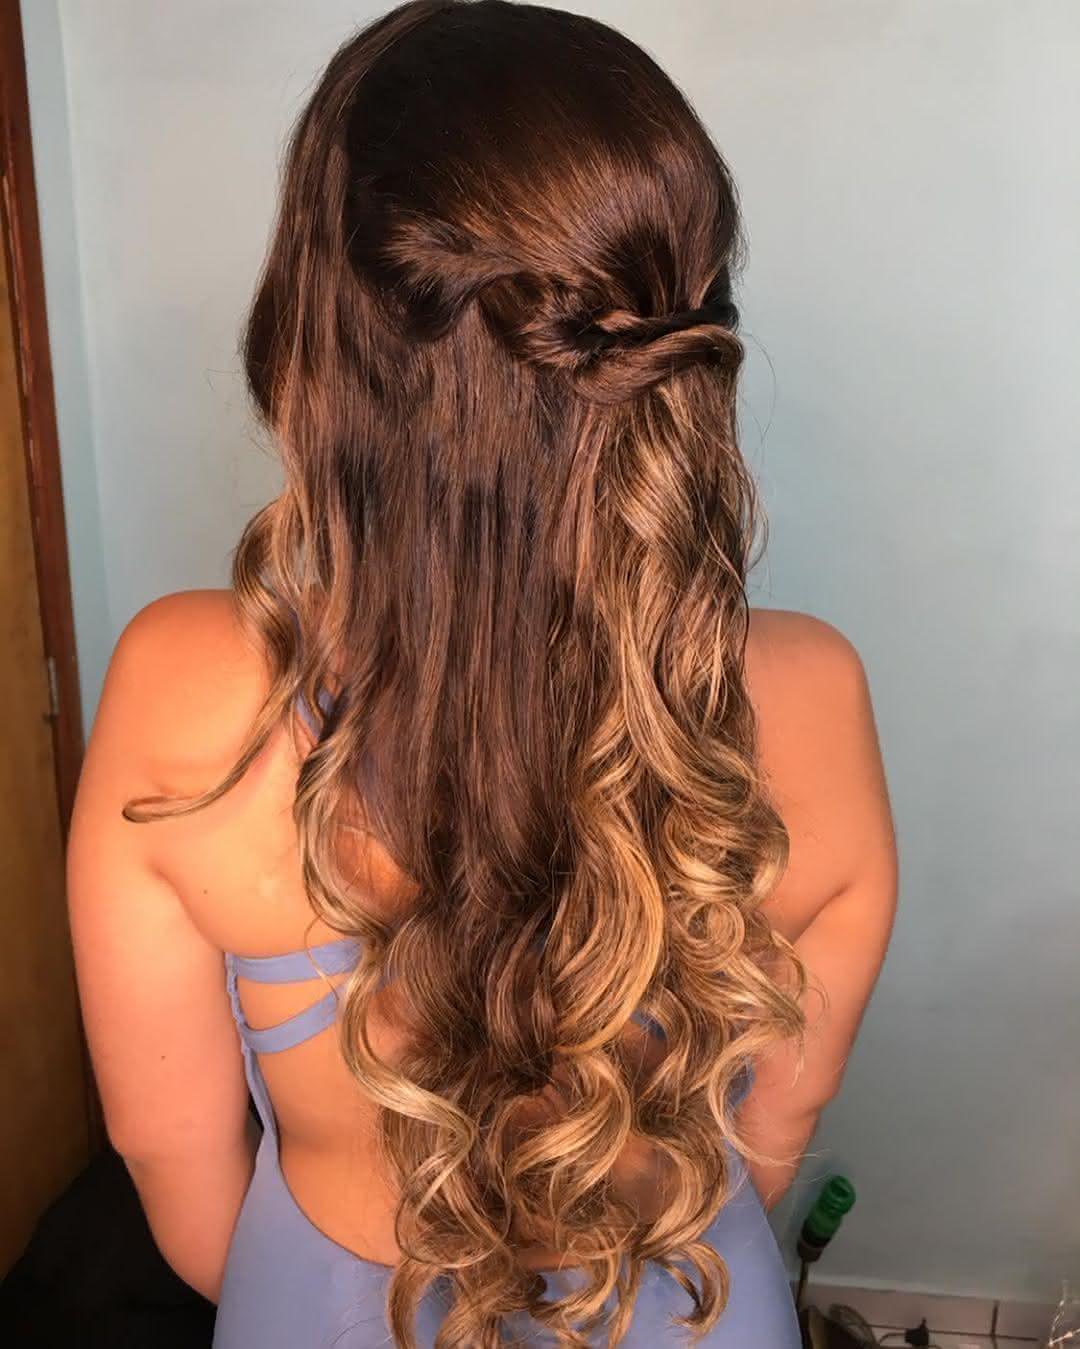 penteado-cabelo-solto